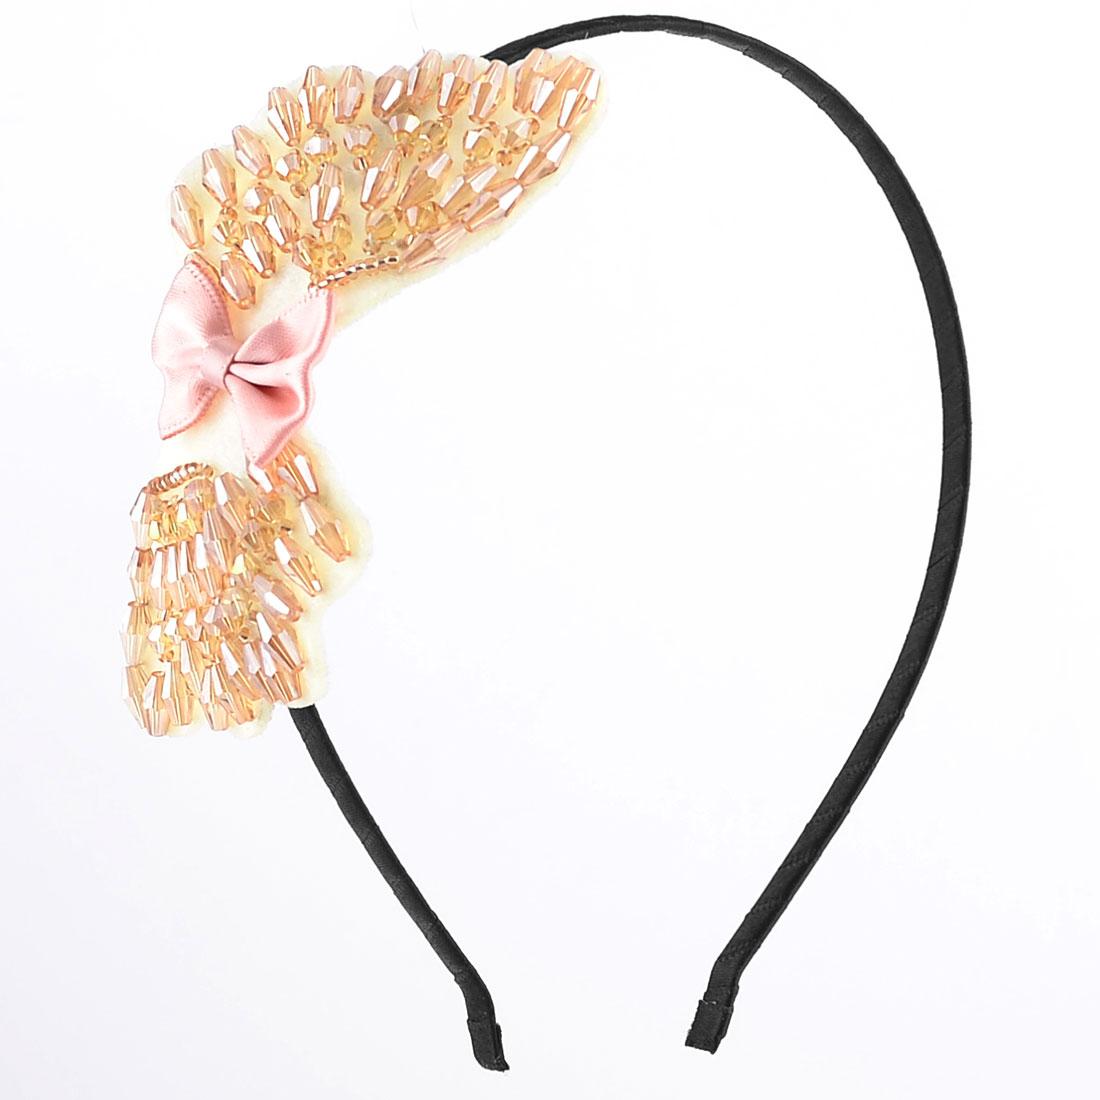 Brown Faceted Beads Decor Bowtie Black Metal Frame Hair Hoop Headband for Ladies